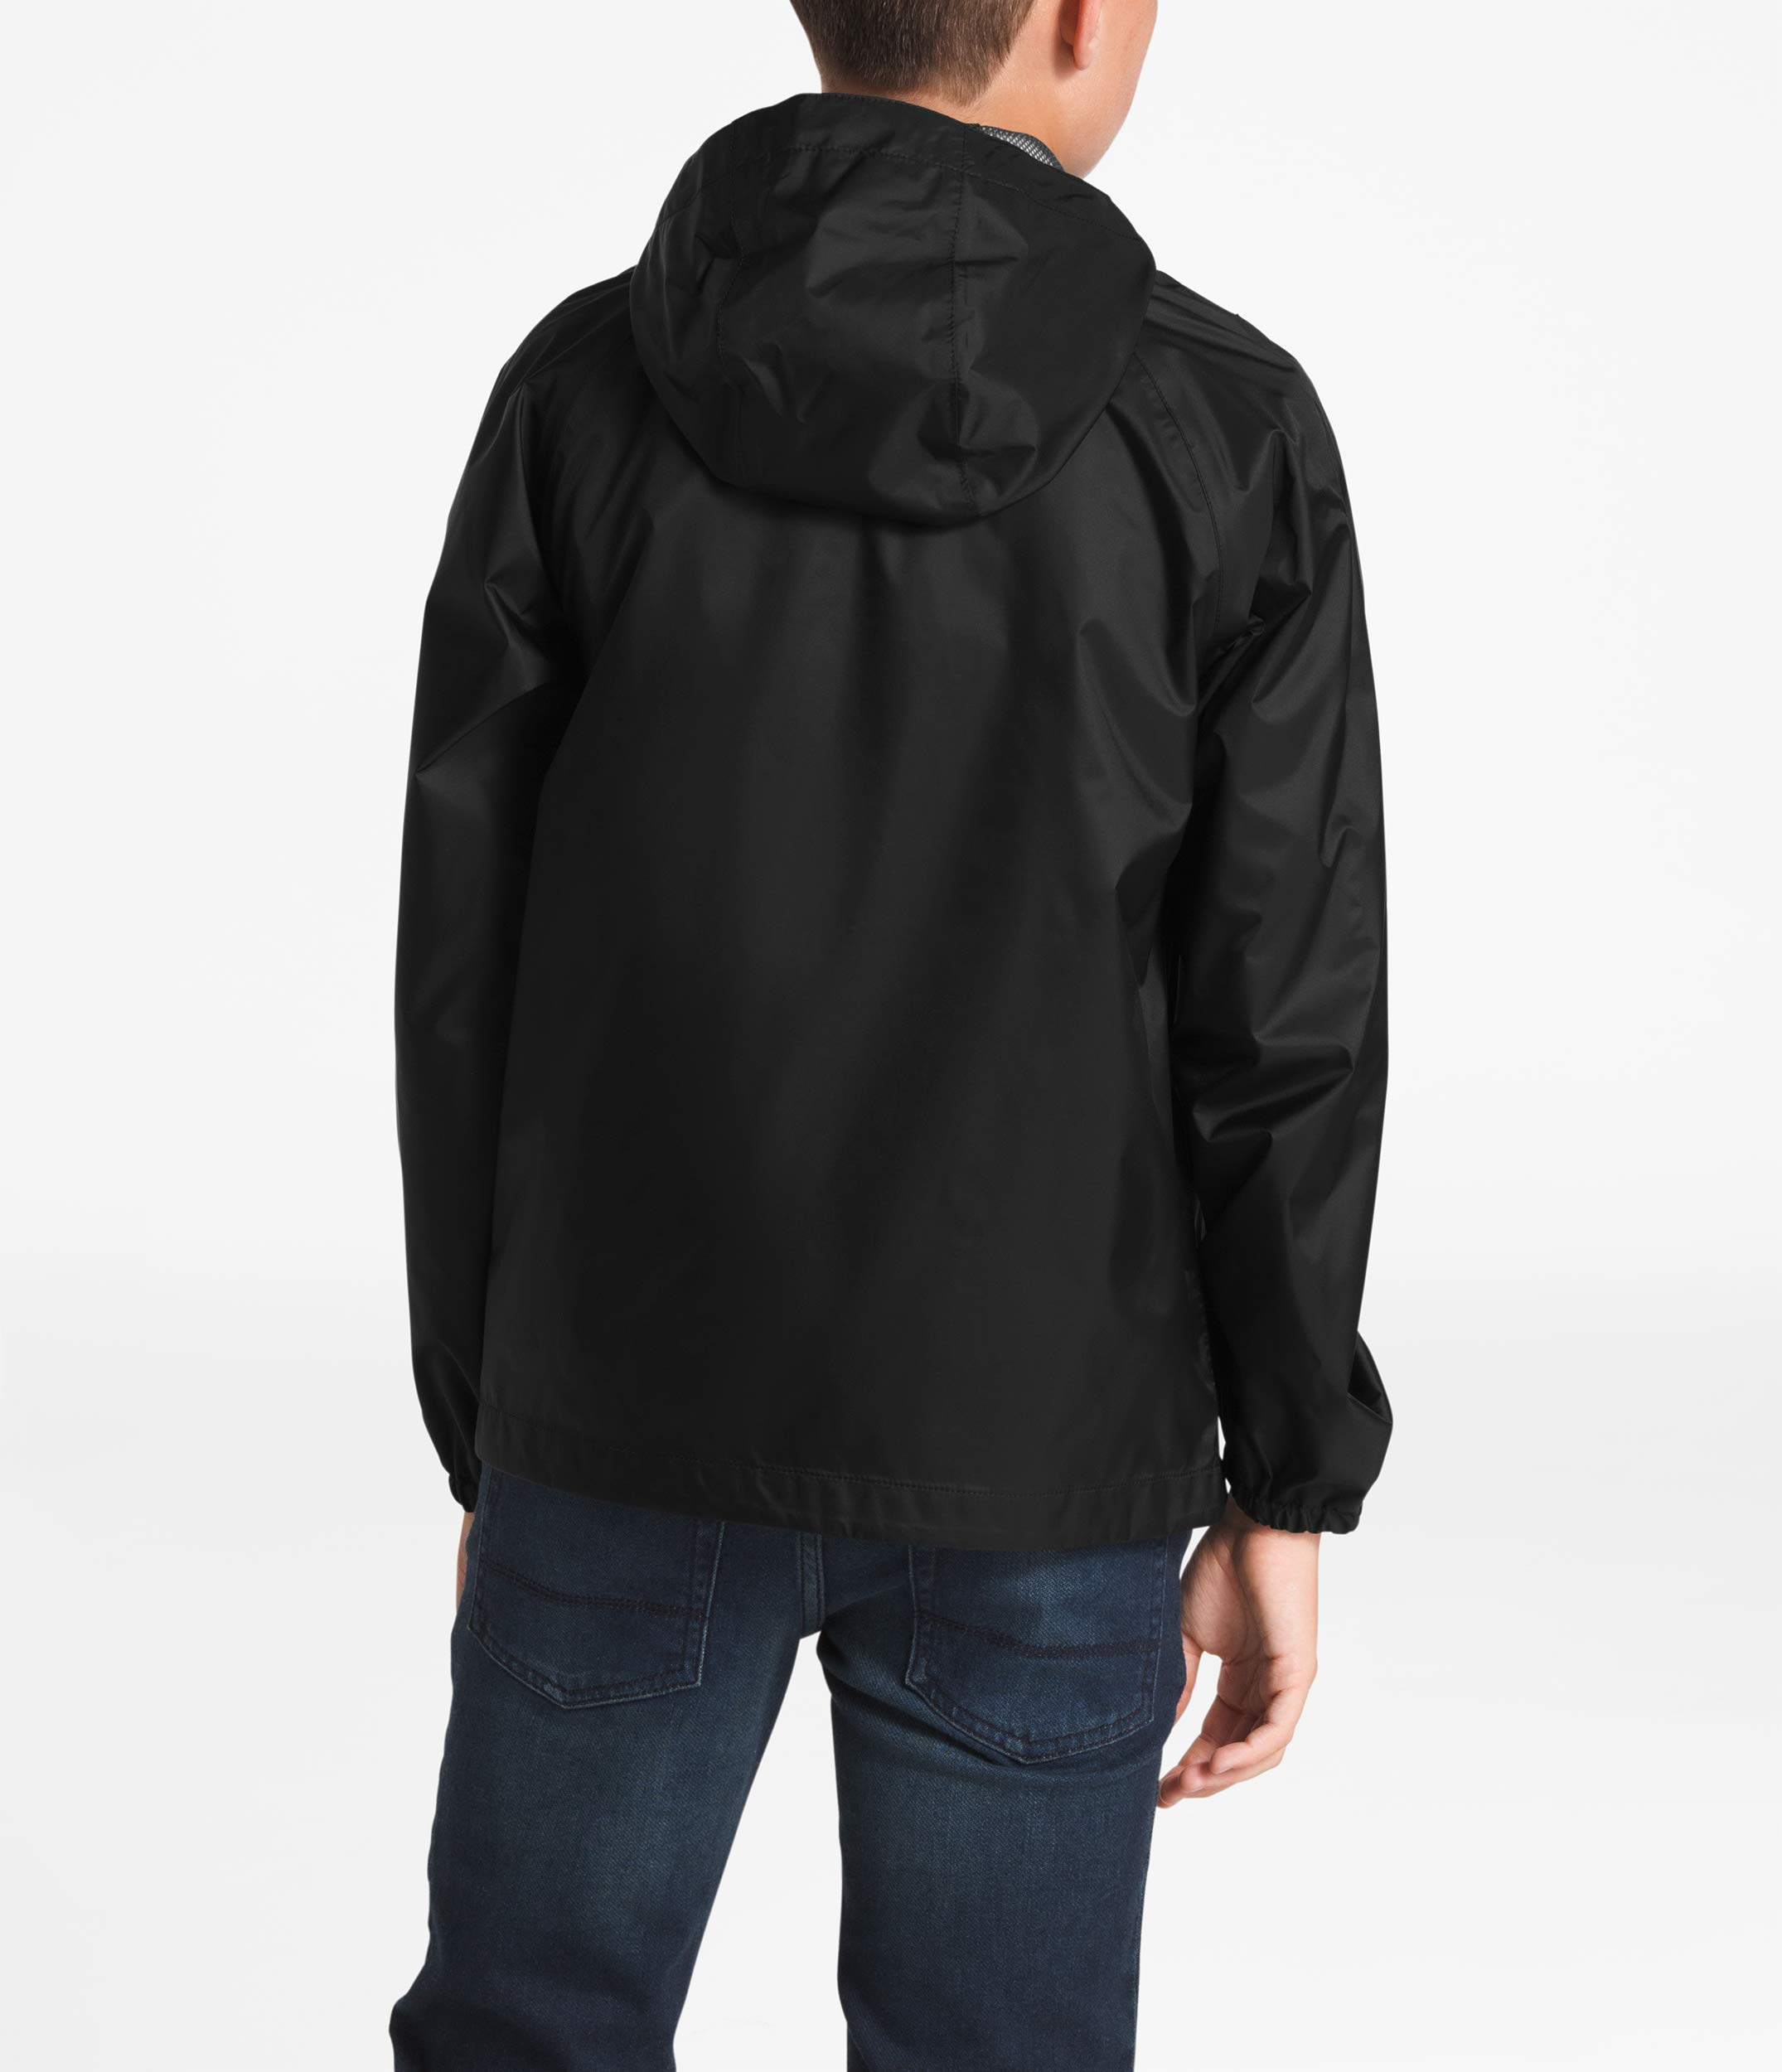 The North Face Kids Boy's Zipline Rain Jacket (Little Kids/Big Kids) TNF Black Large by The North Face (Image #2)